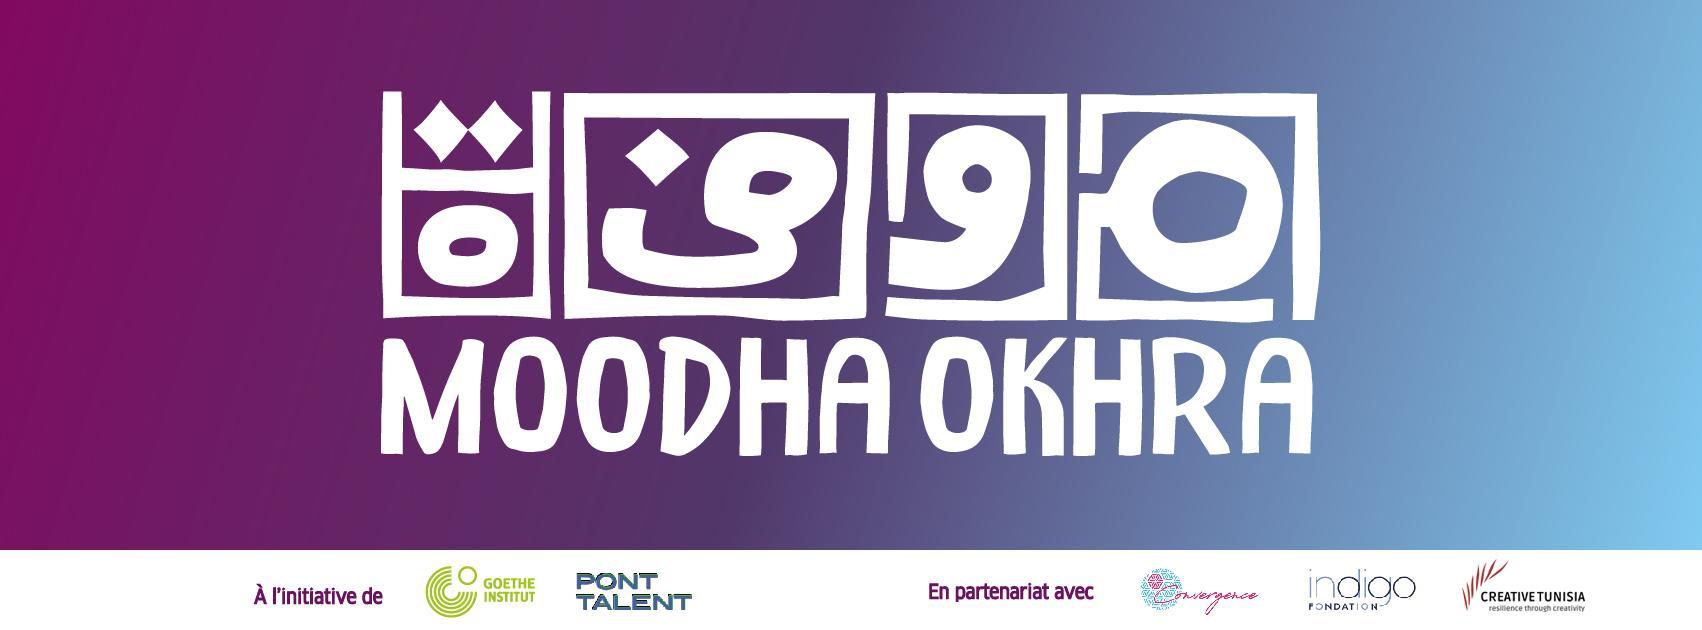 Moodha Okhra Bannière